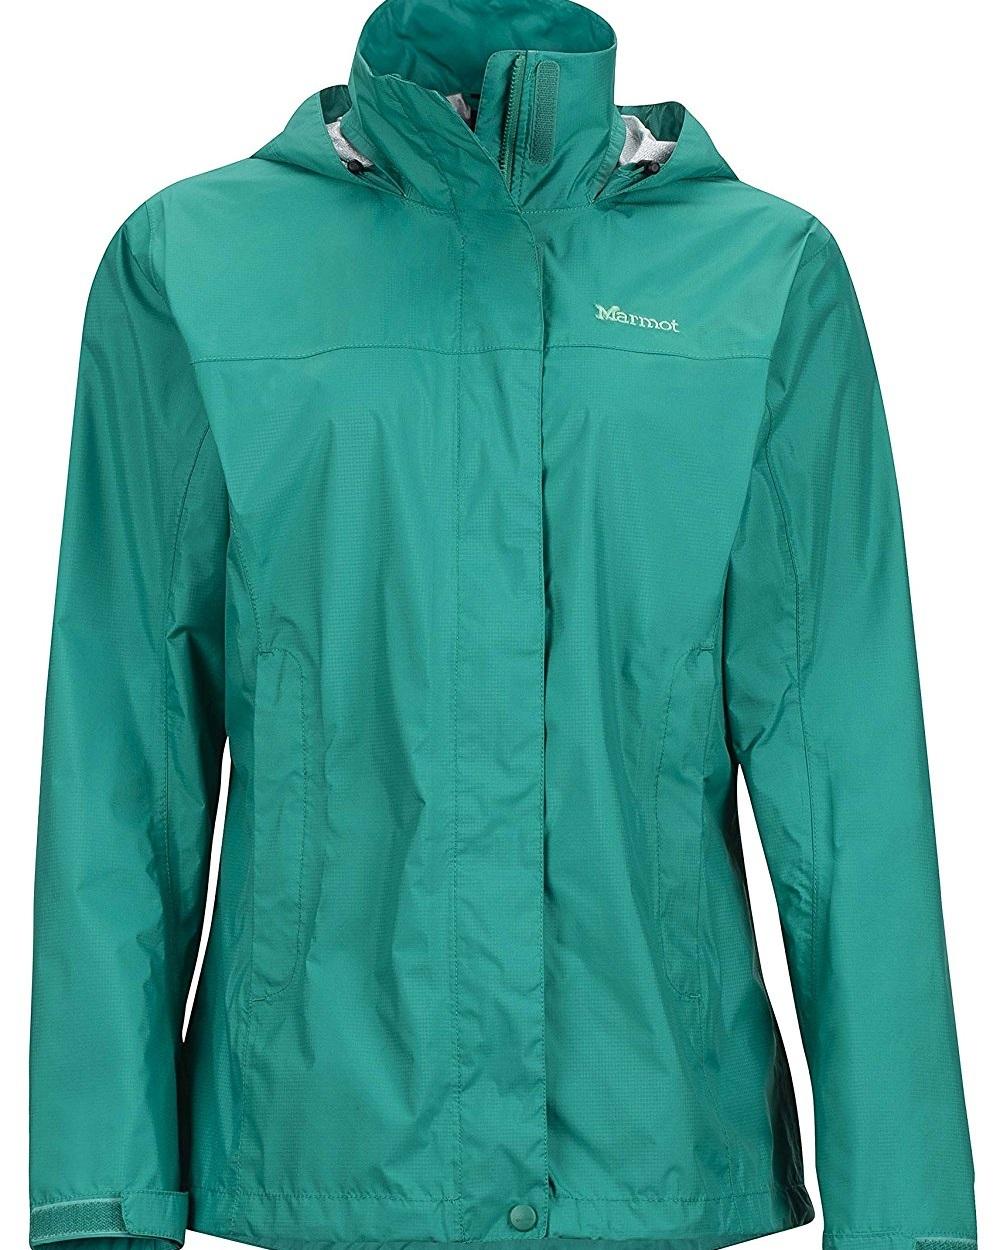 Rain Jacket - keep dry in the rain and fog. -